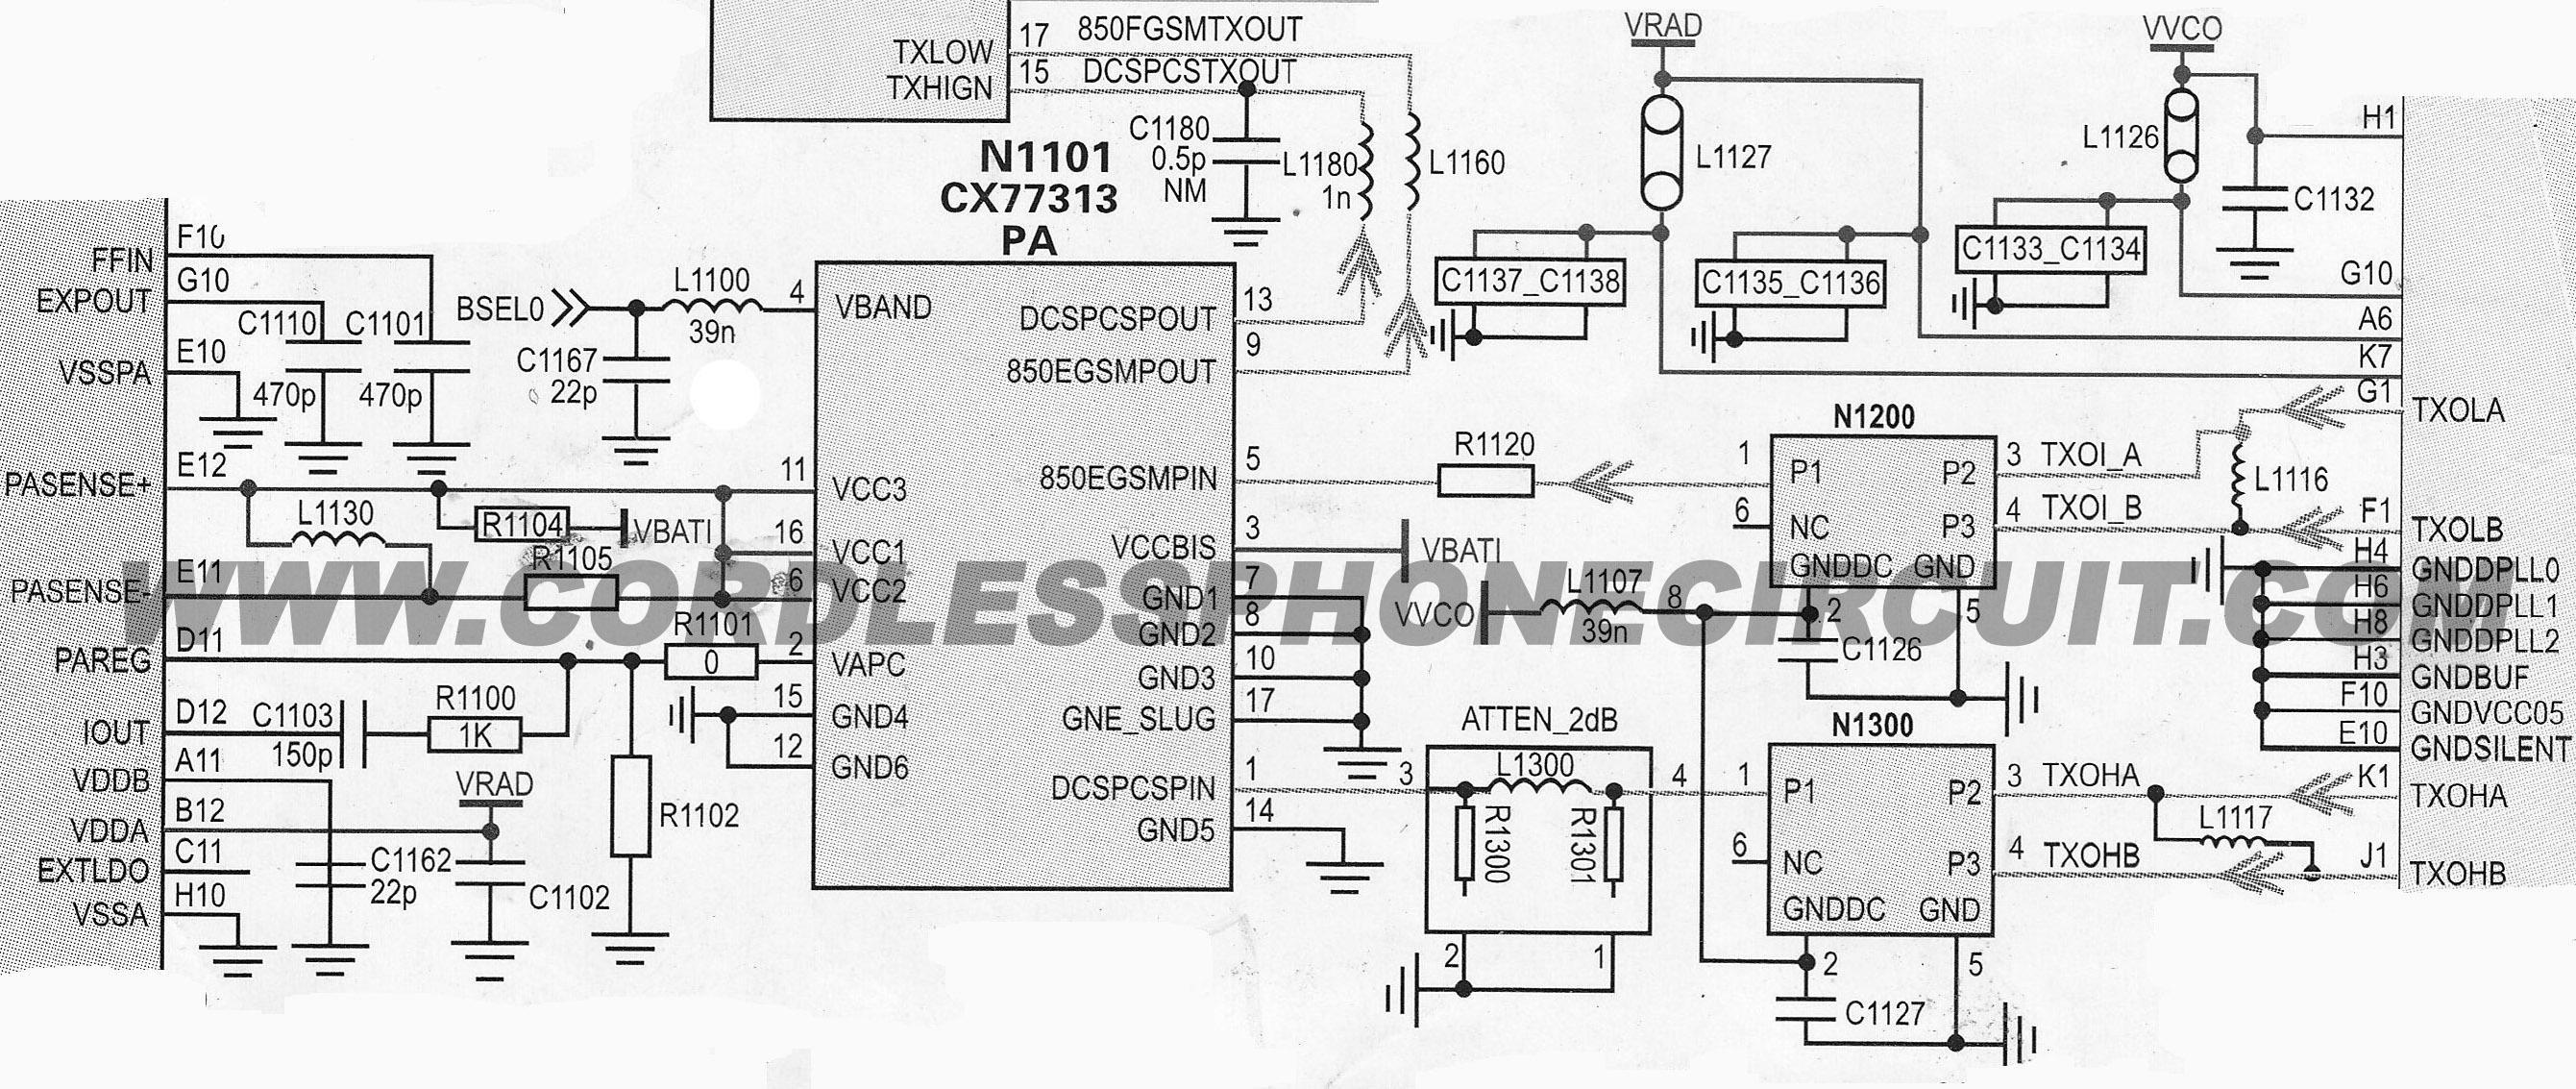 Fabulous Alarm System Wiring Diagram Diymidcom Autowiring Mx Tl Wiring Cloud Itislusmarecoveryedborg